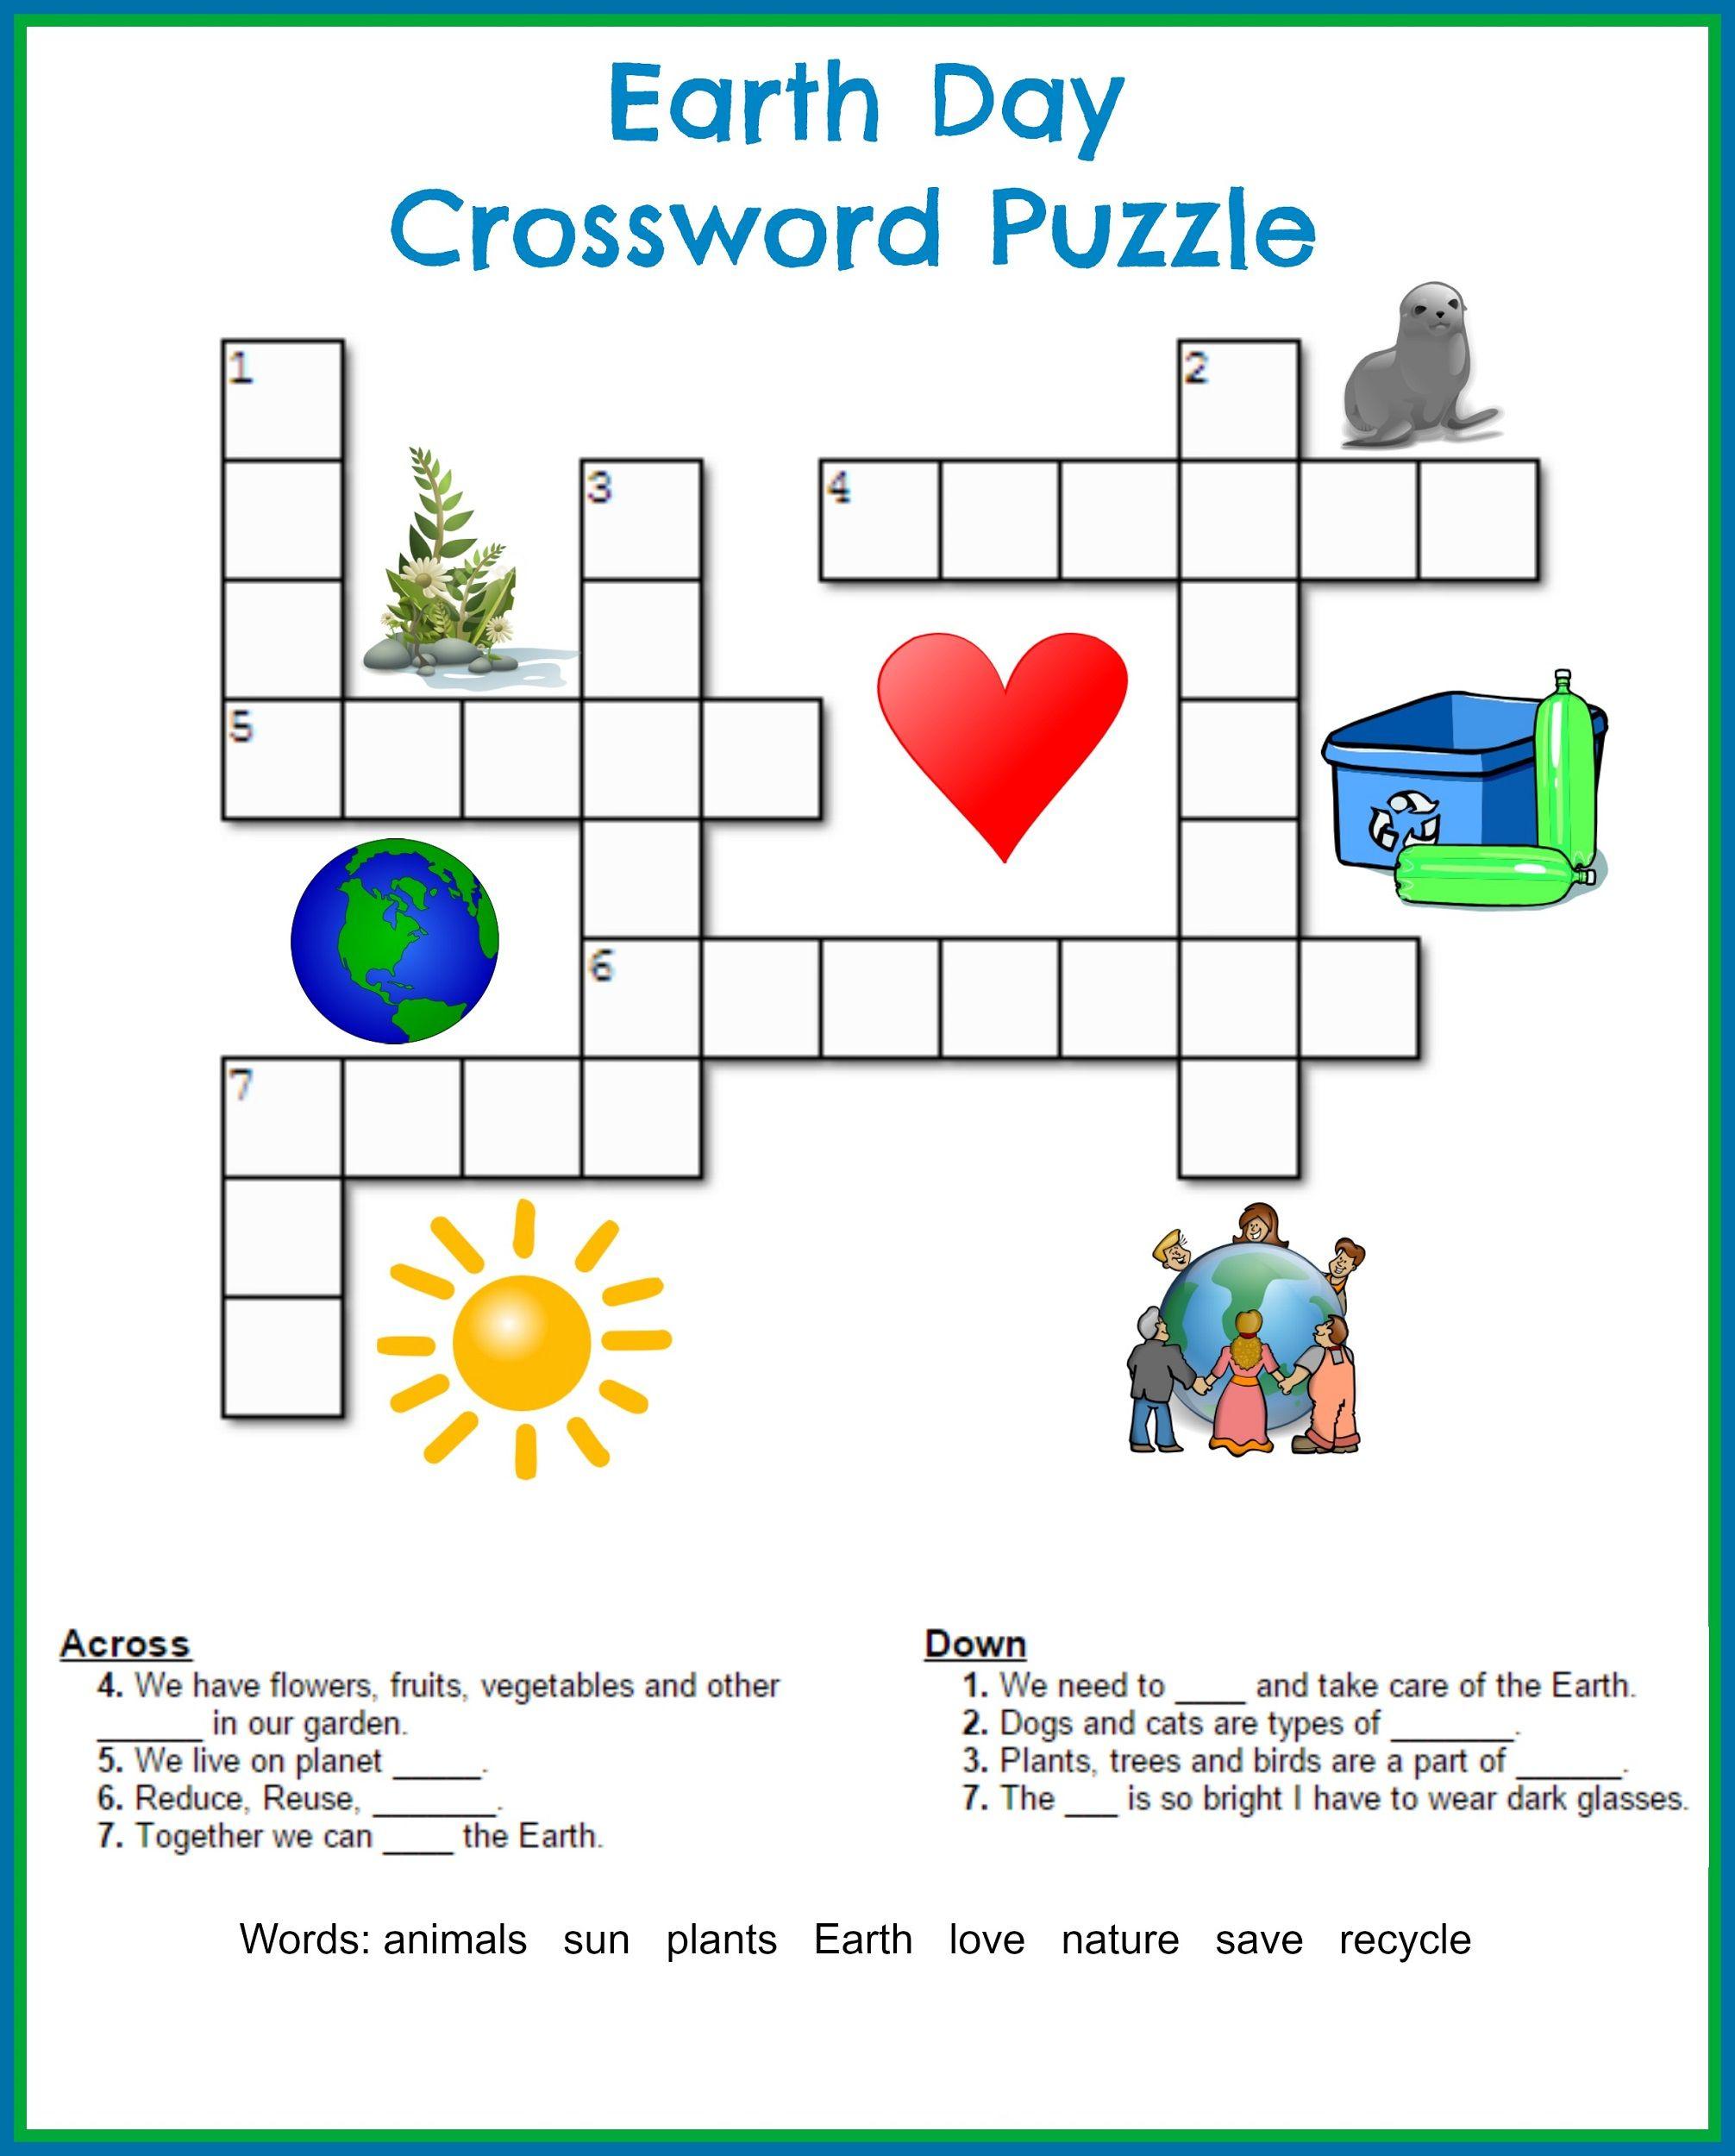 Printable Crossword Puzzles Kids | Crossword Puzzles On Earth - Printable Crossword Puzzles For Grade 1